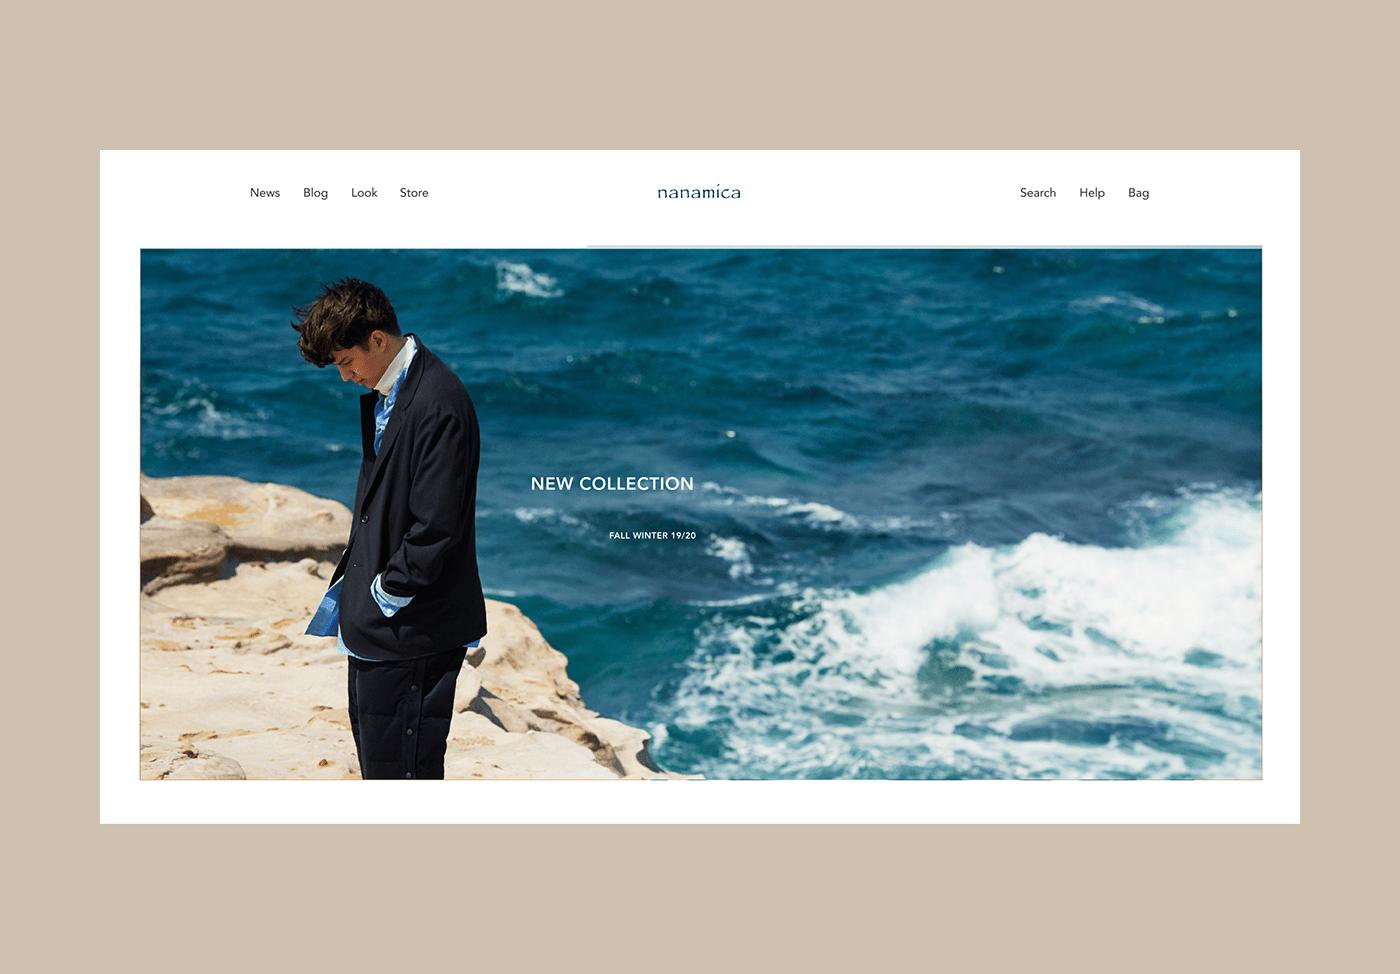 Image may contain: man and beach